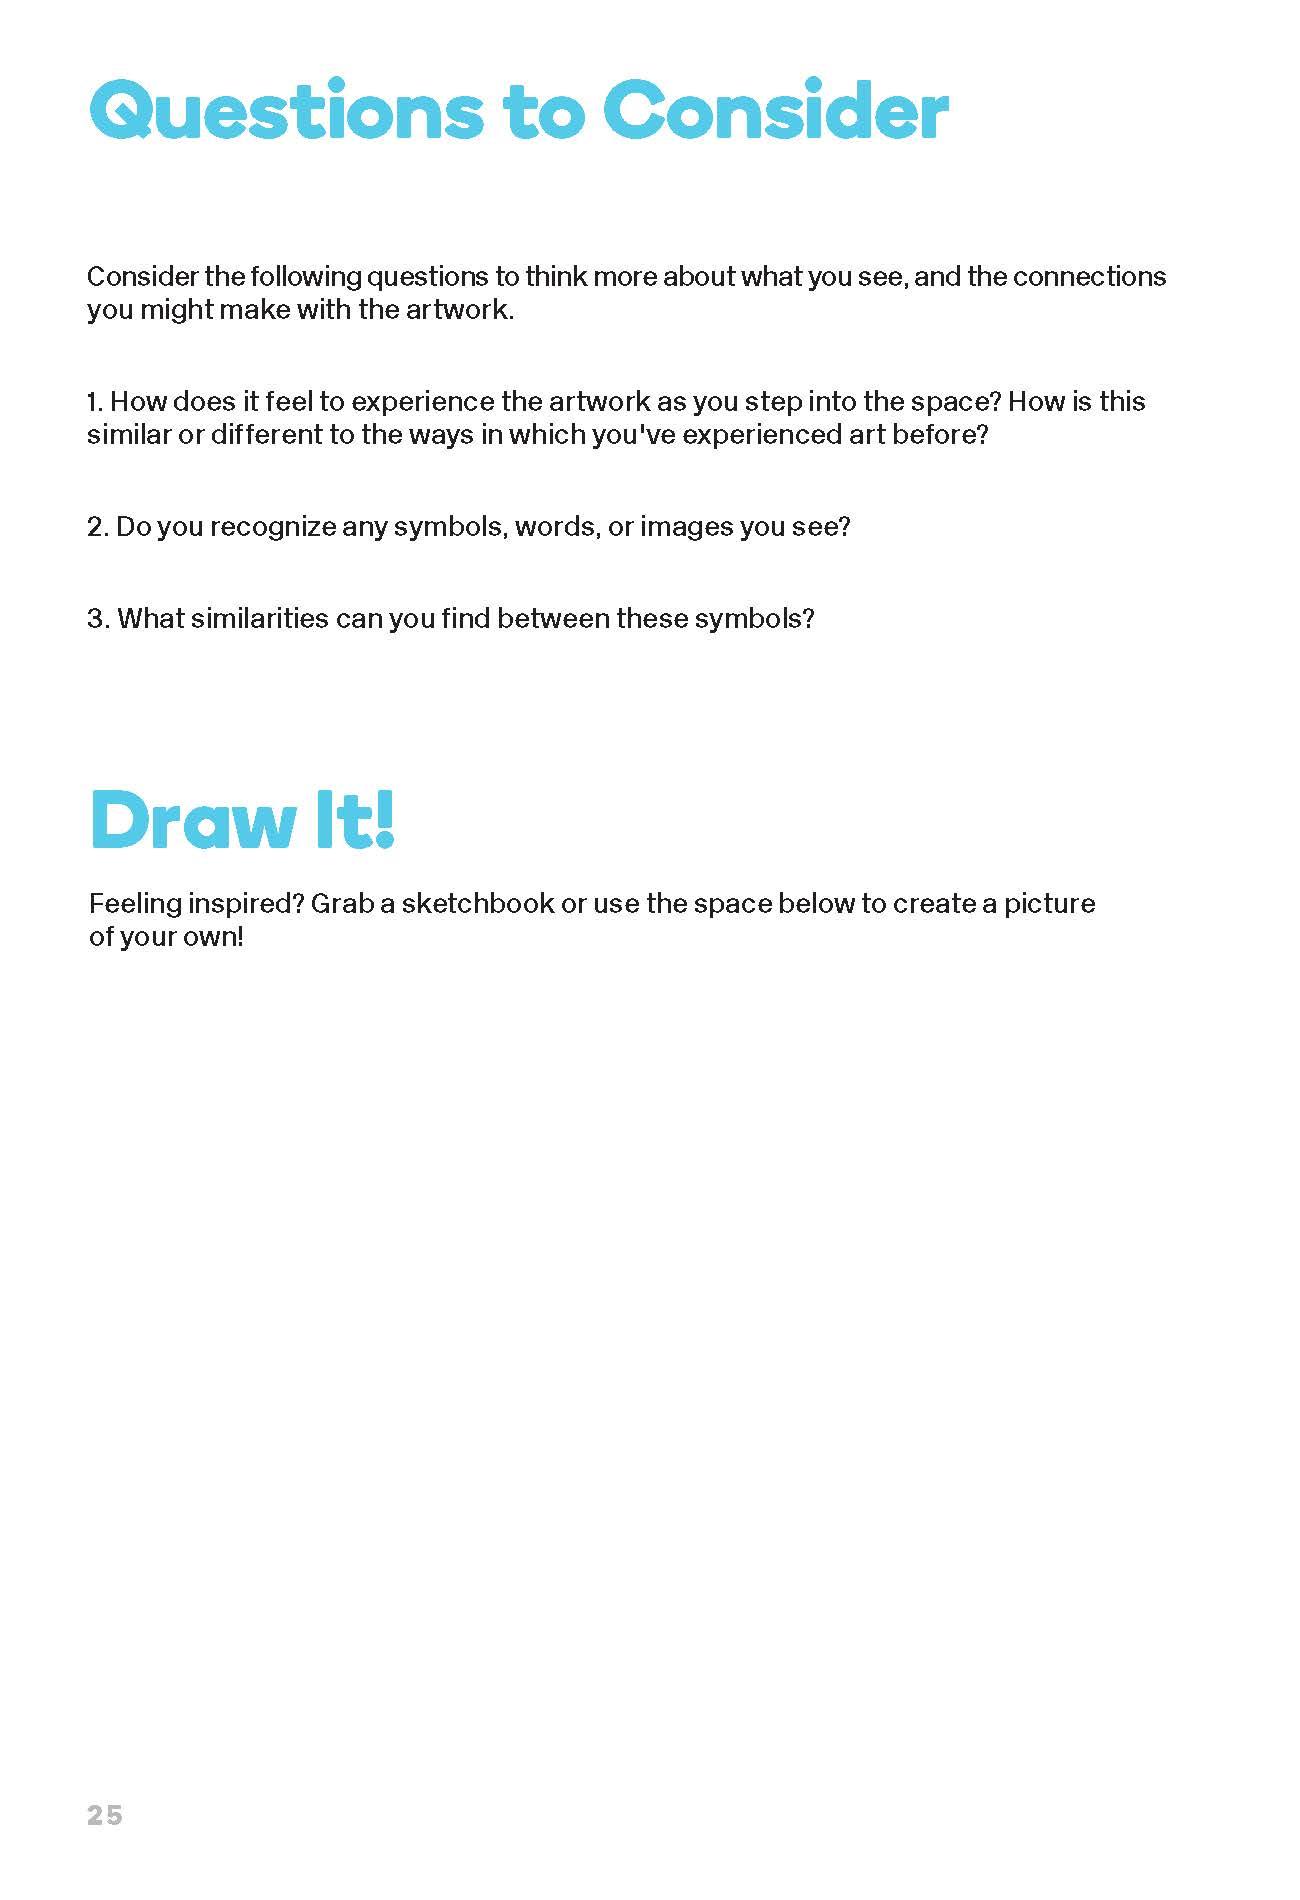 SMoH_Brochure_FireleiBaez_Proof_Page_27.jpg